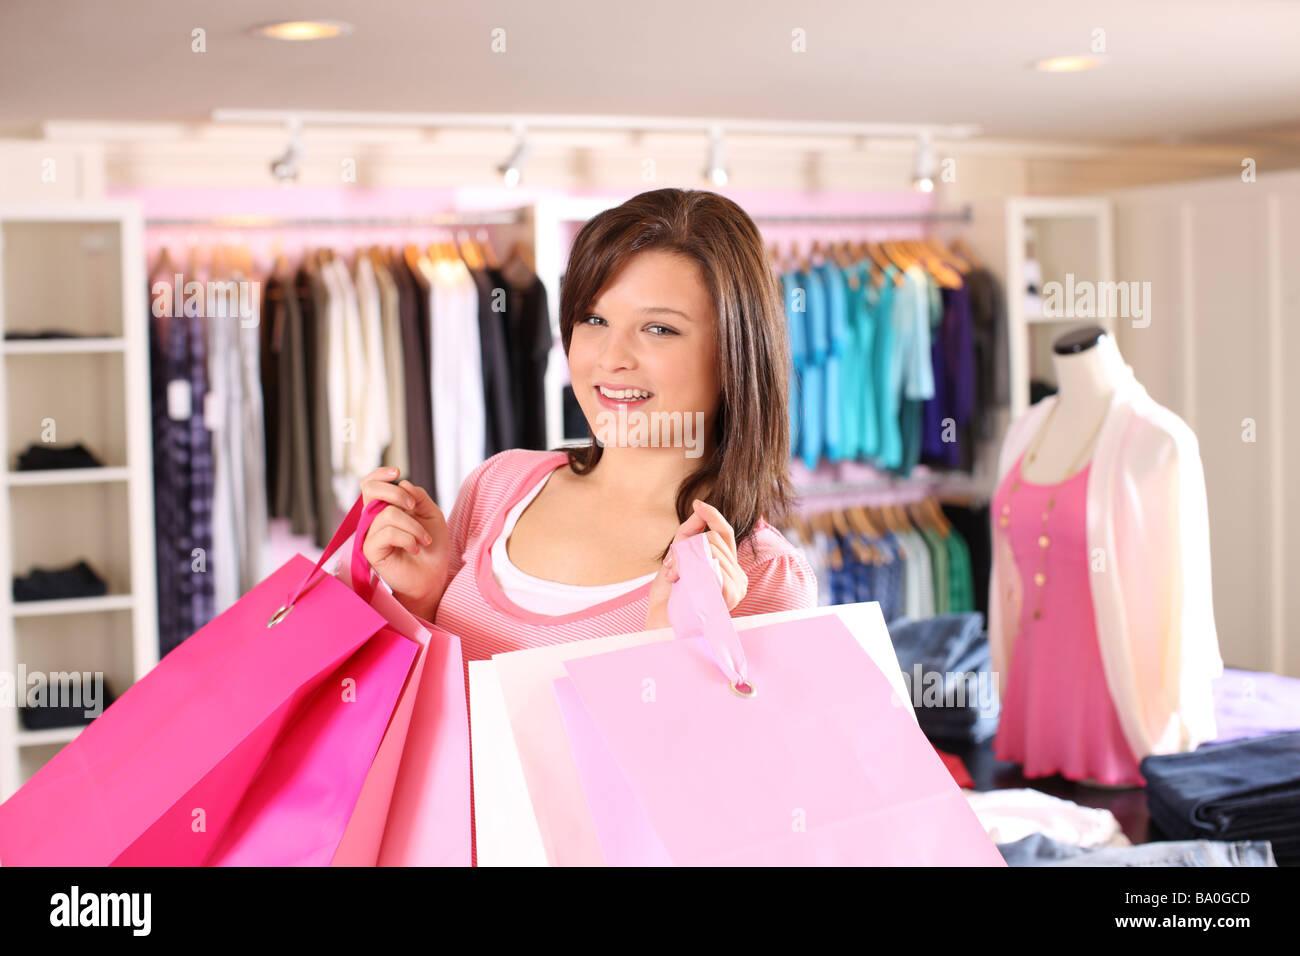 Teen shopper sosteniendo bolsas Foto de stock